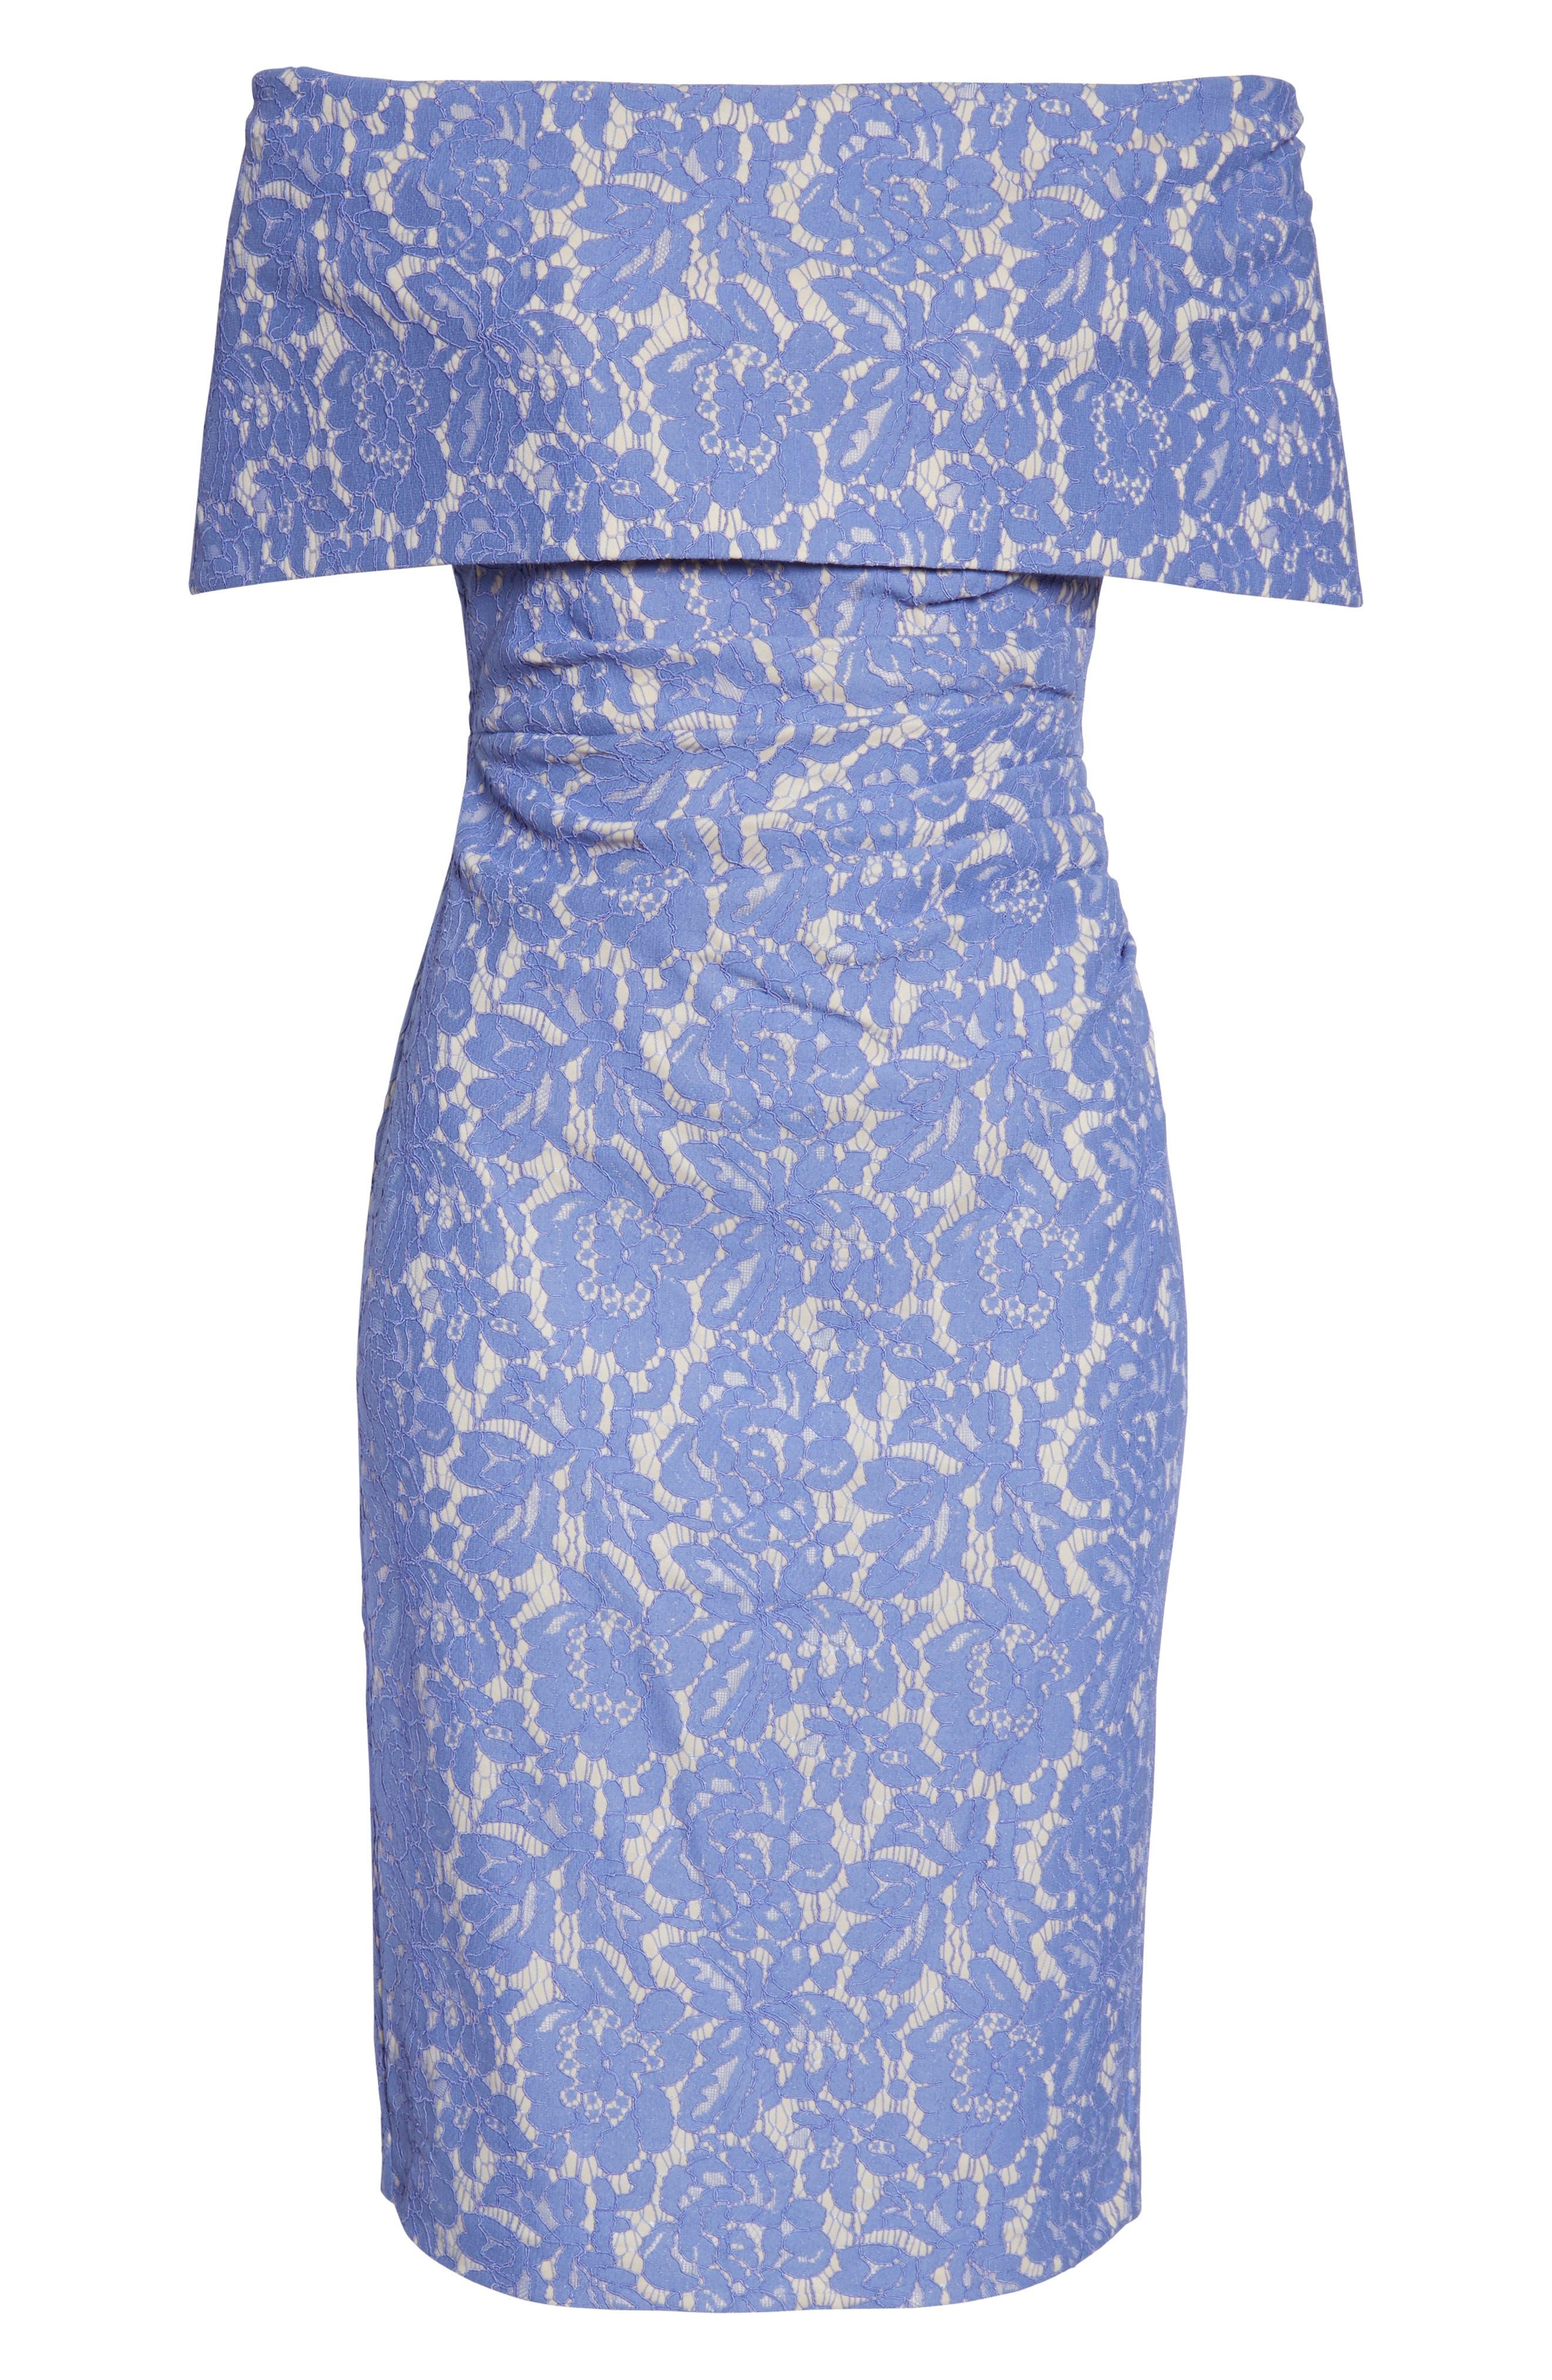 VINCE CAMUTO,                             Off the Shoulder Lace Sheath Dress,                             Alternate thumbnail 7, color,                             PERIWINKLE